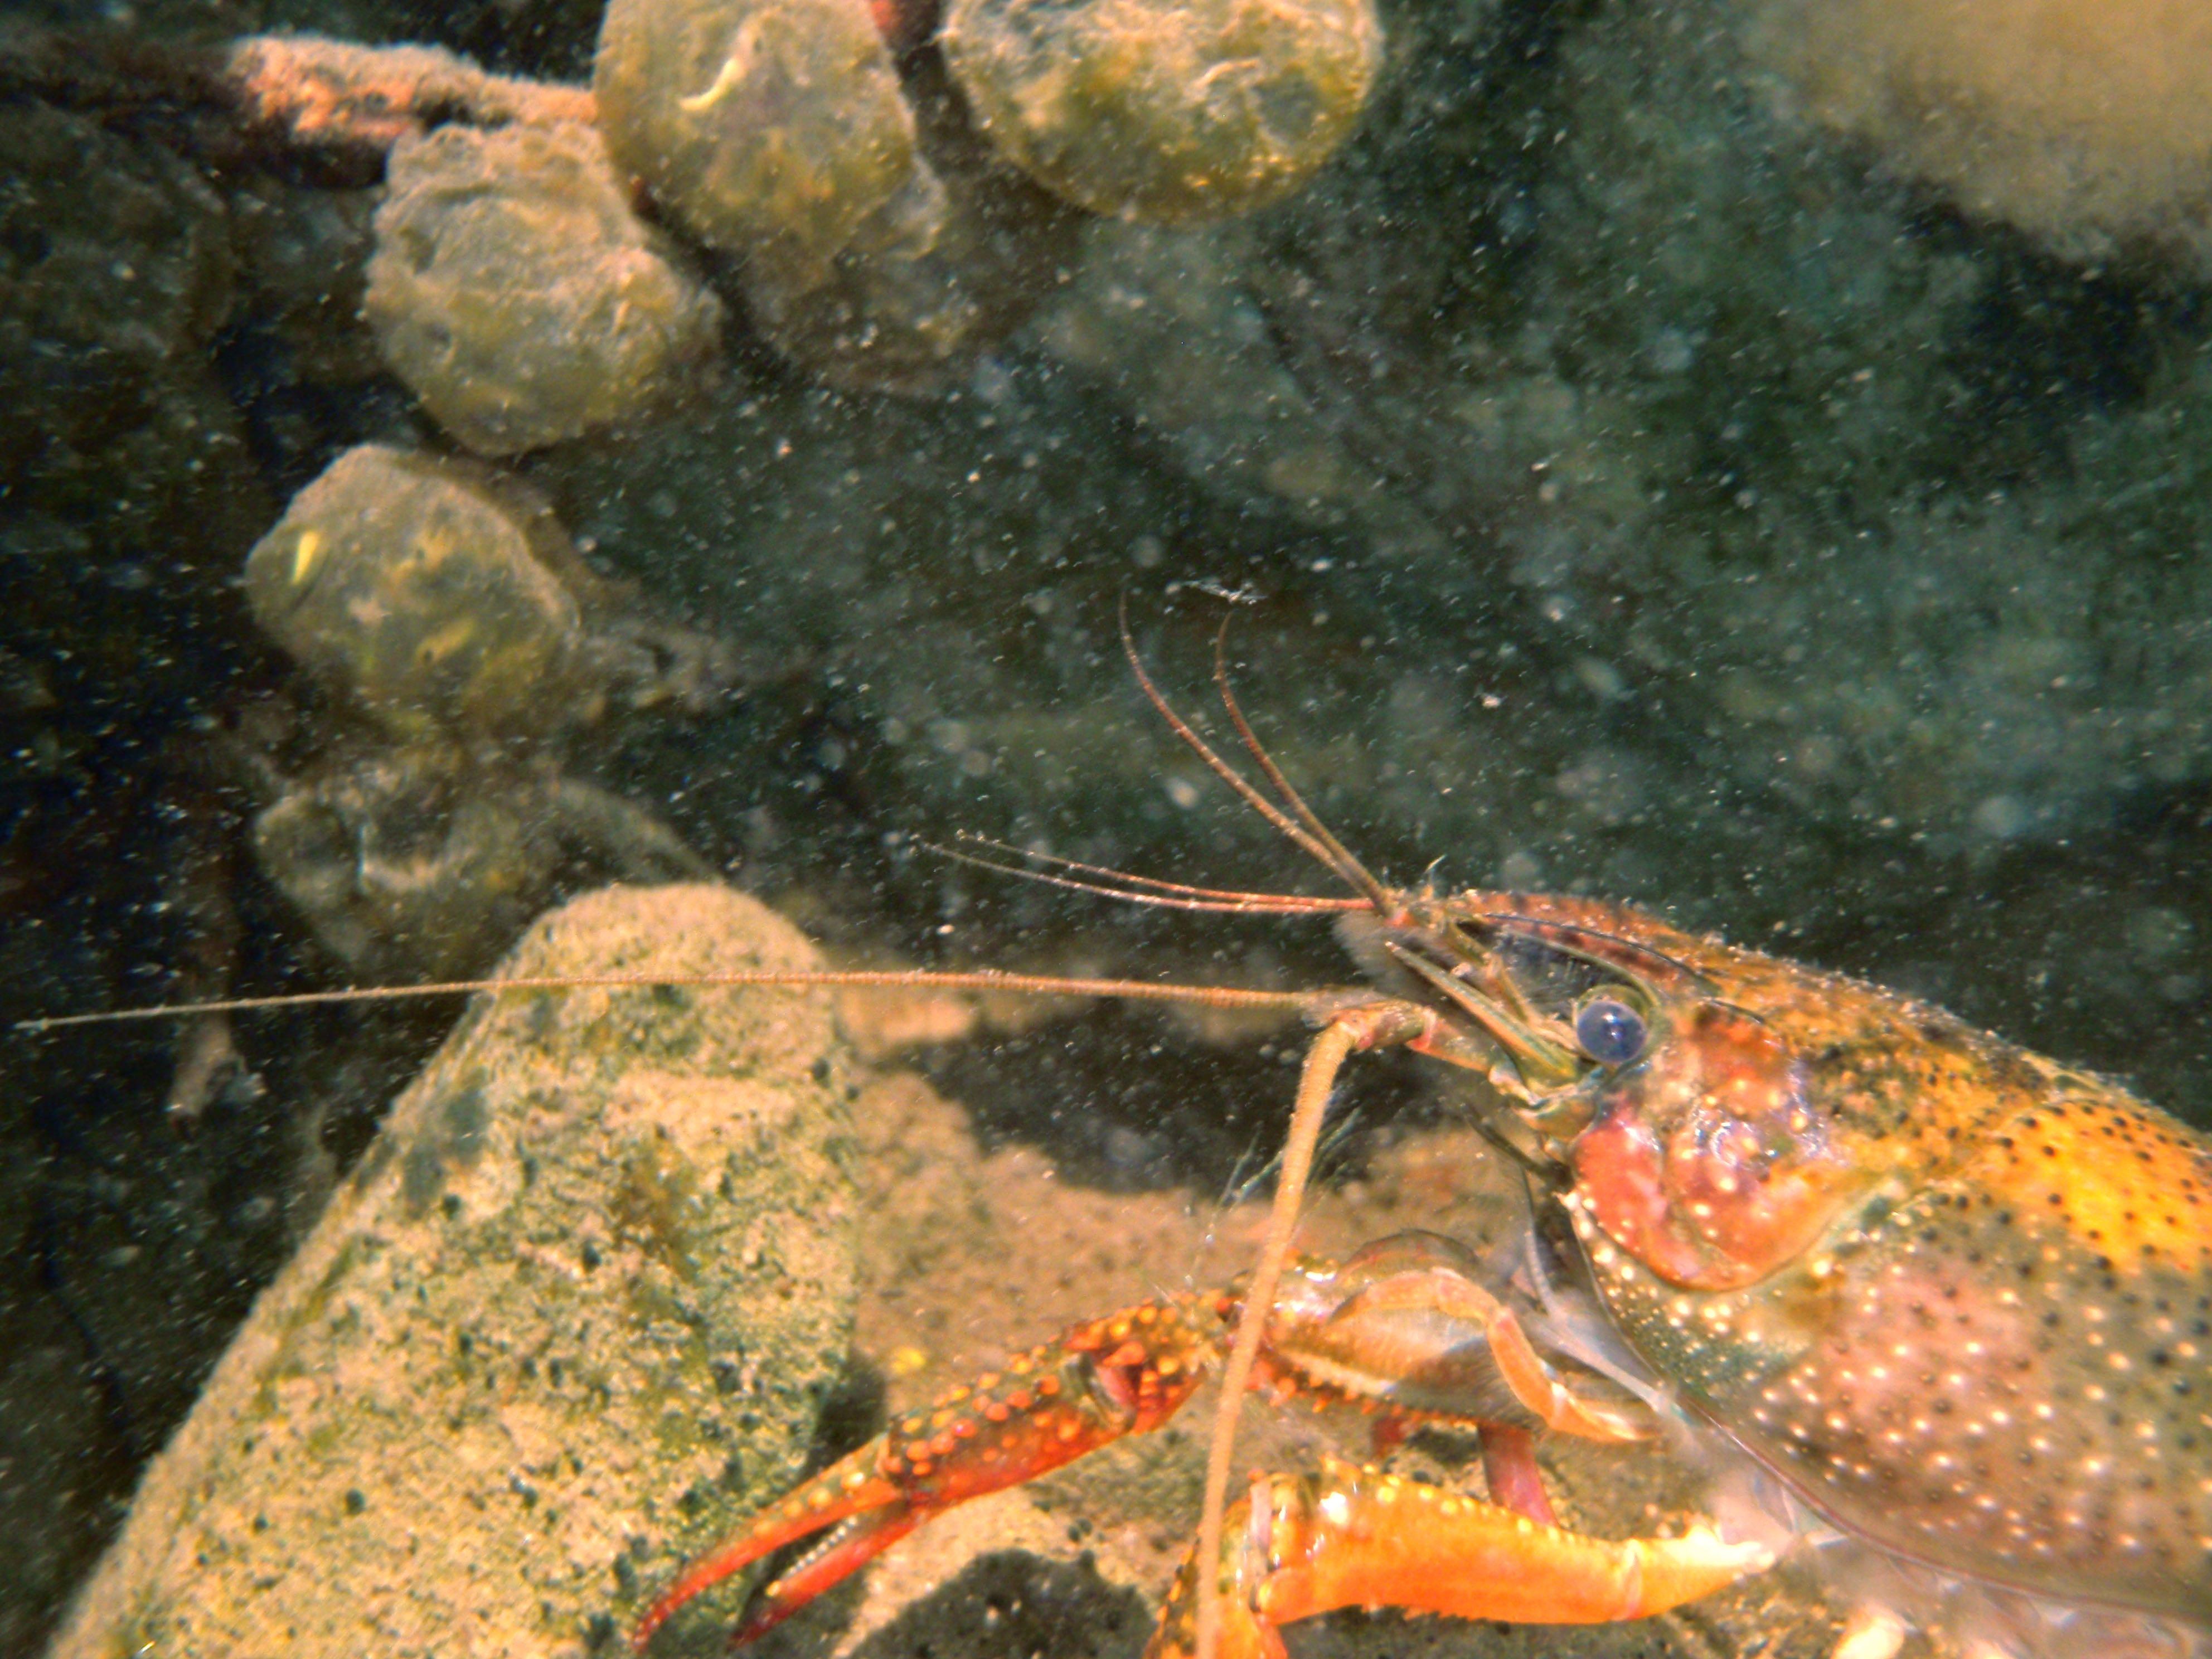 crayfish, egg masses, clutches